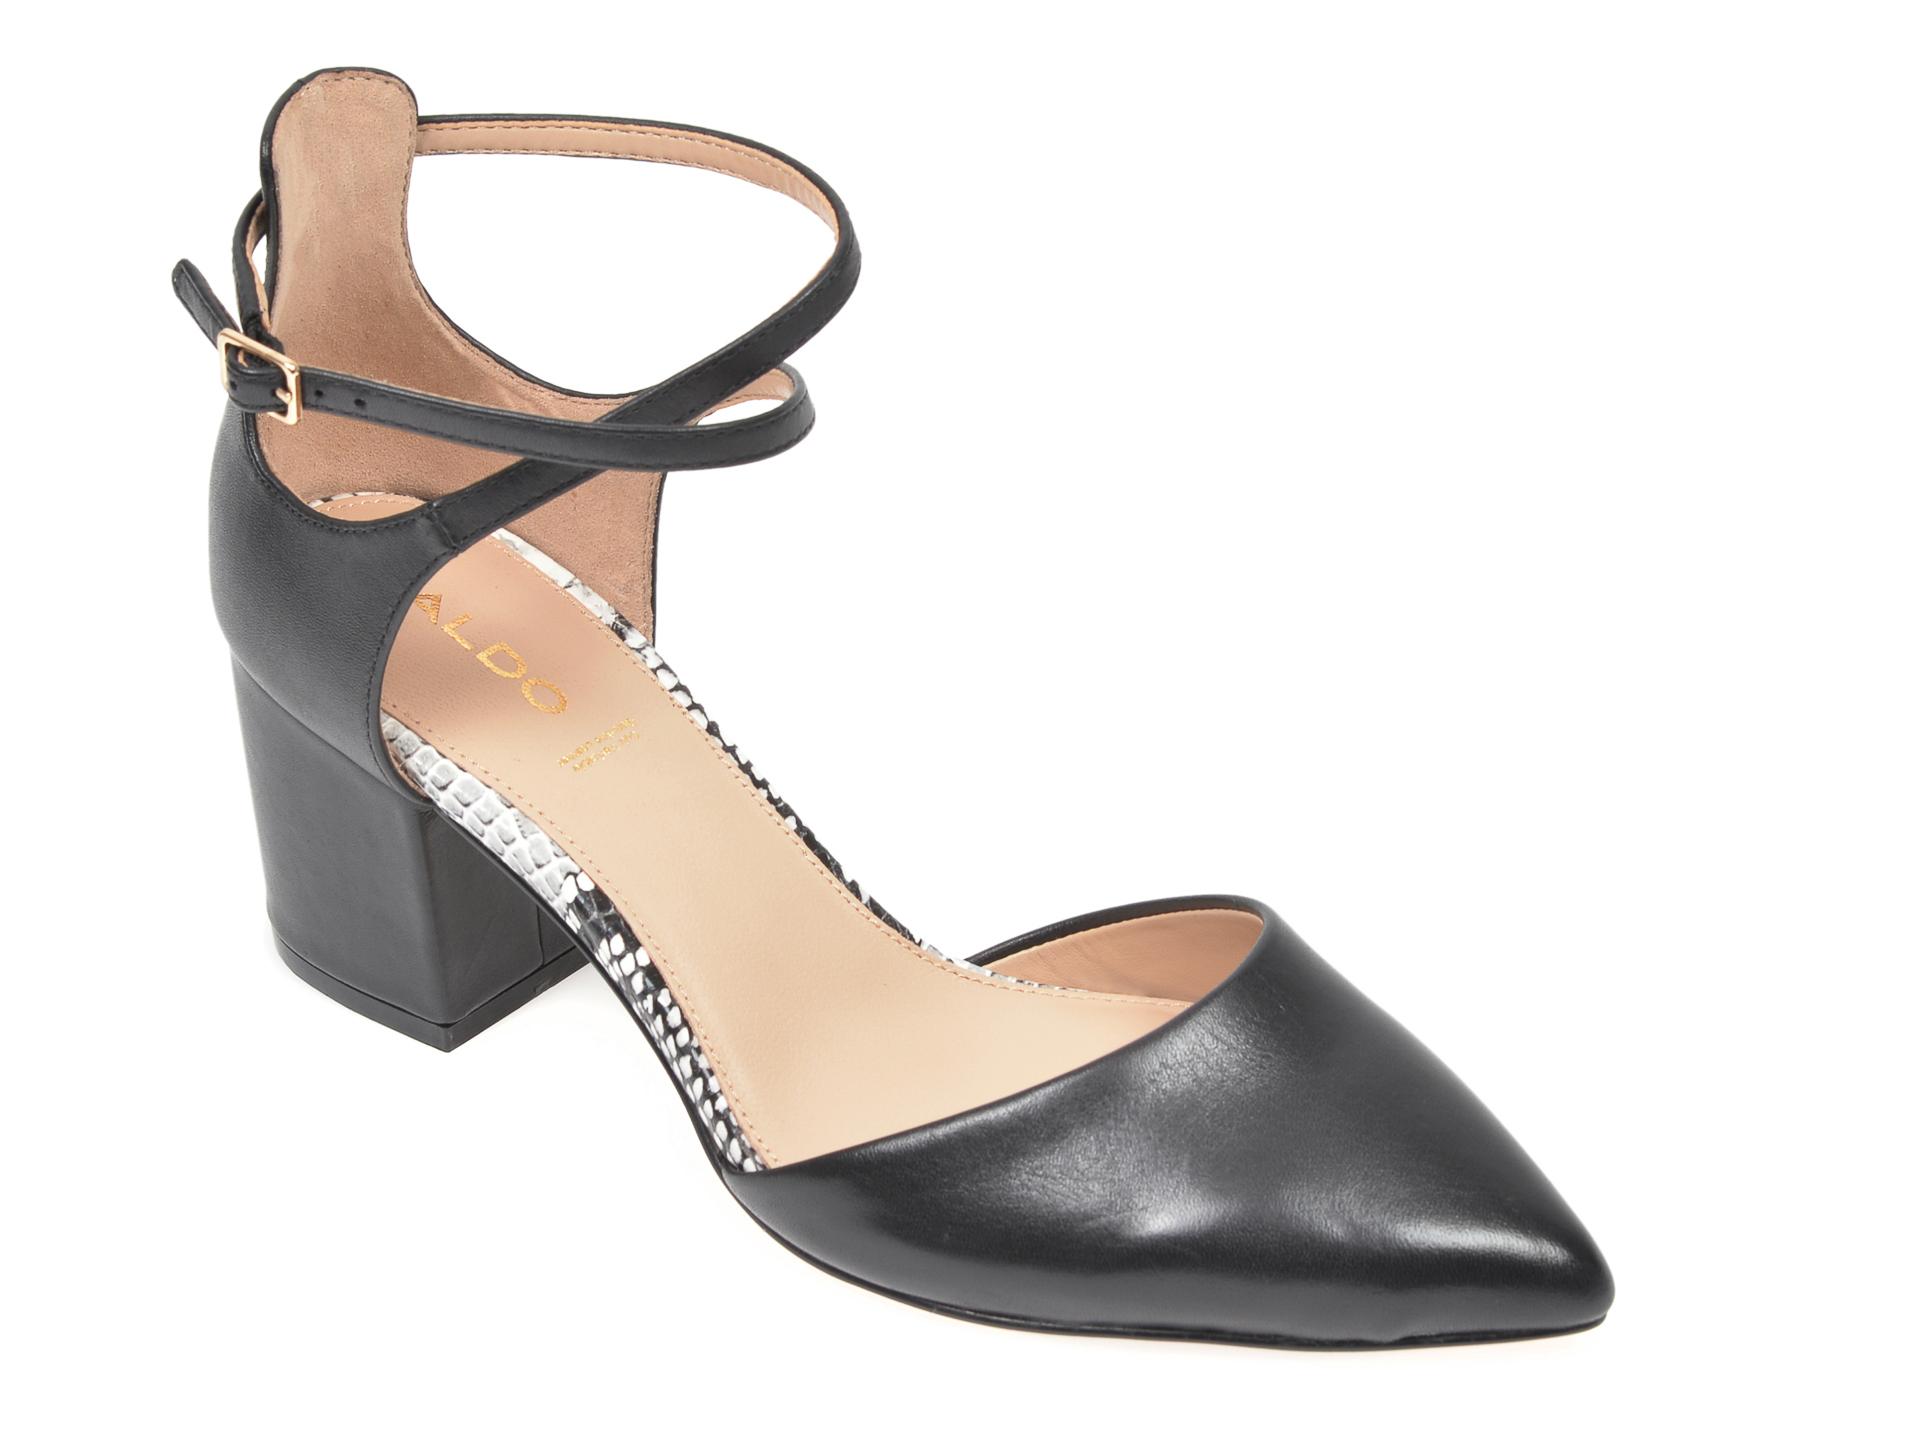 Pantofi ALDO negri, Brookshear007, din piele naturala imagine